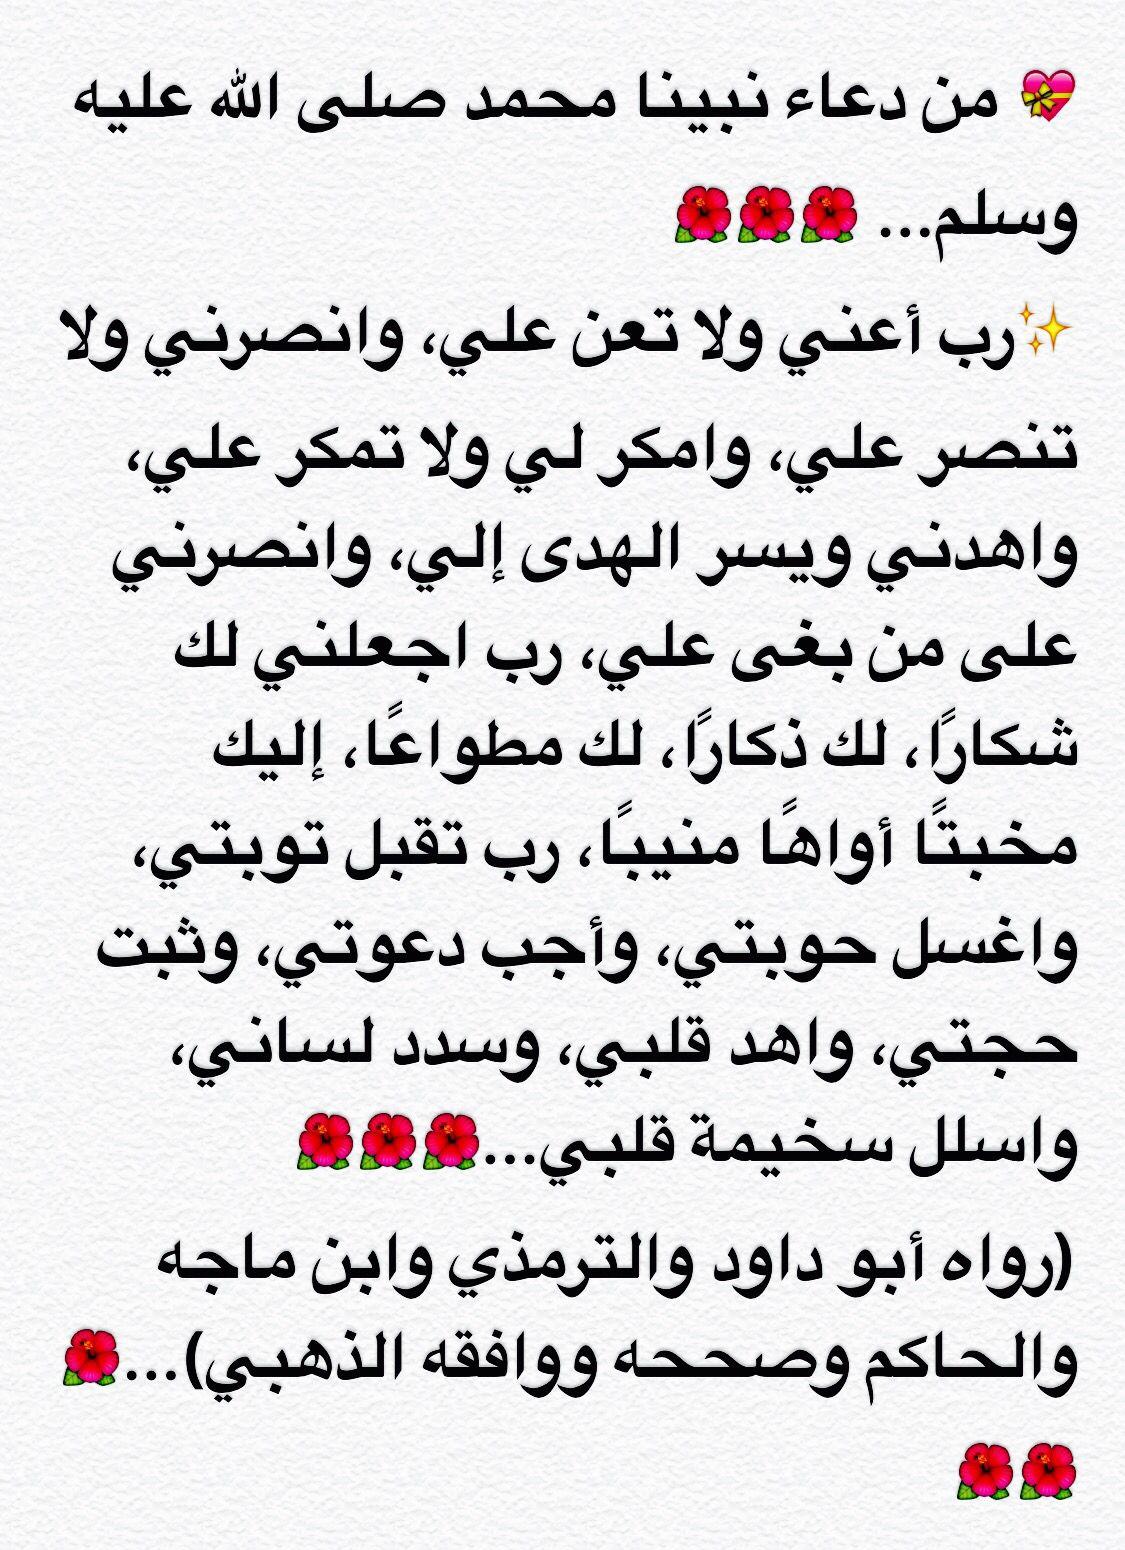 tags: #muhammad the prophet of islam#angel gabriel and muhammad#prophet  muhammad name#prophet muhammad mosque#prophet muhammad birthday#prophet  muhammad